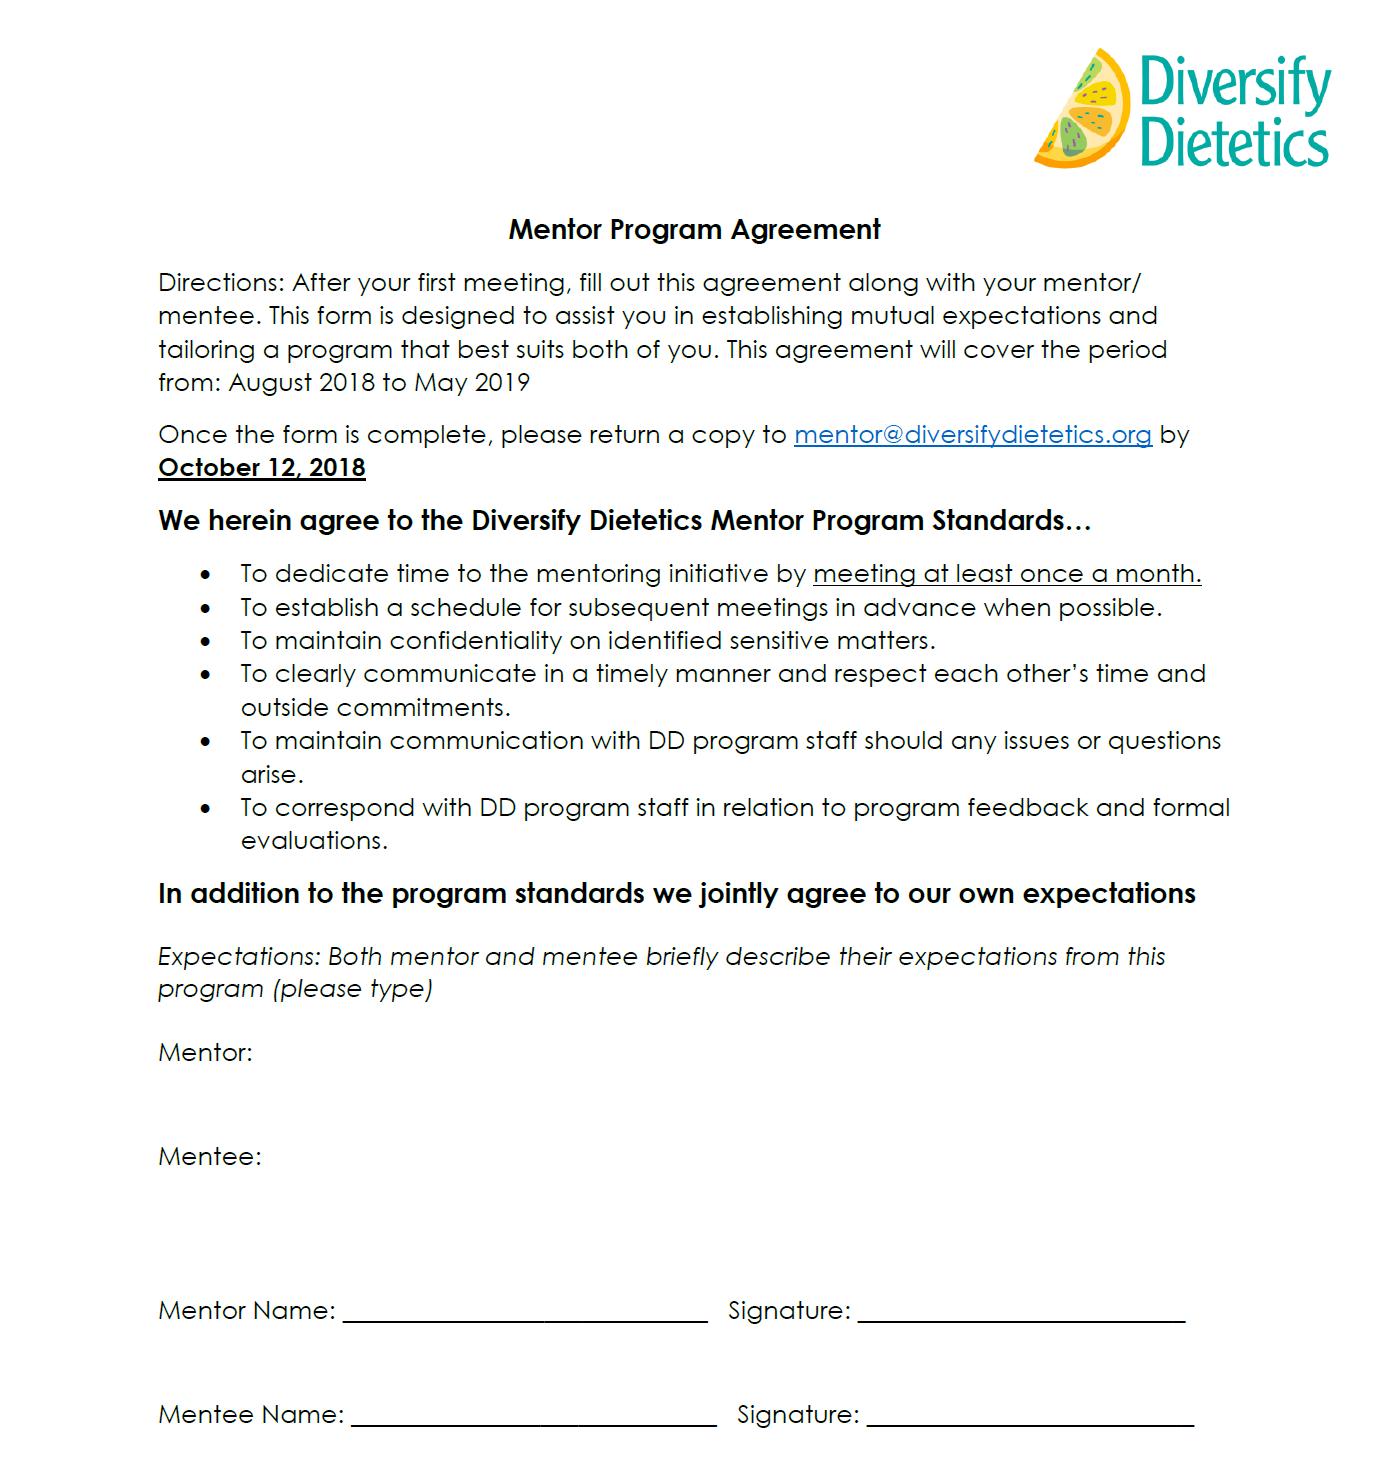 Program Agreement Image.PNG